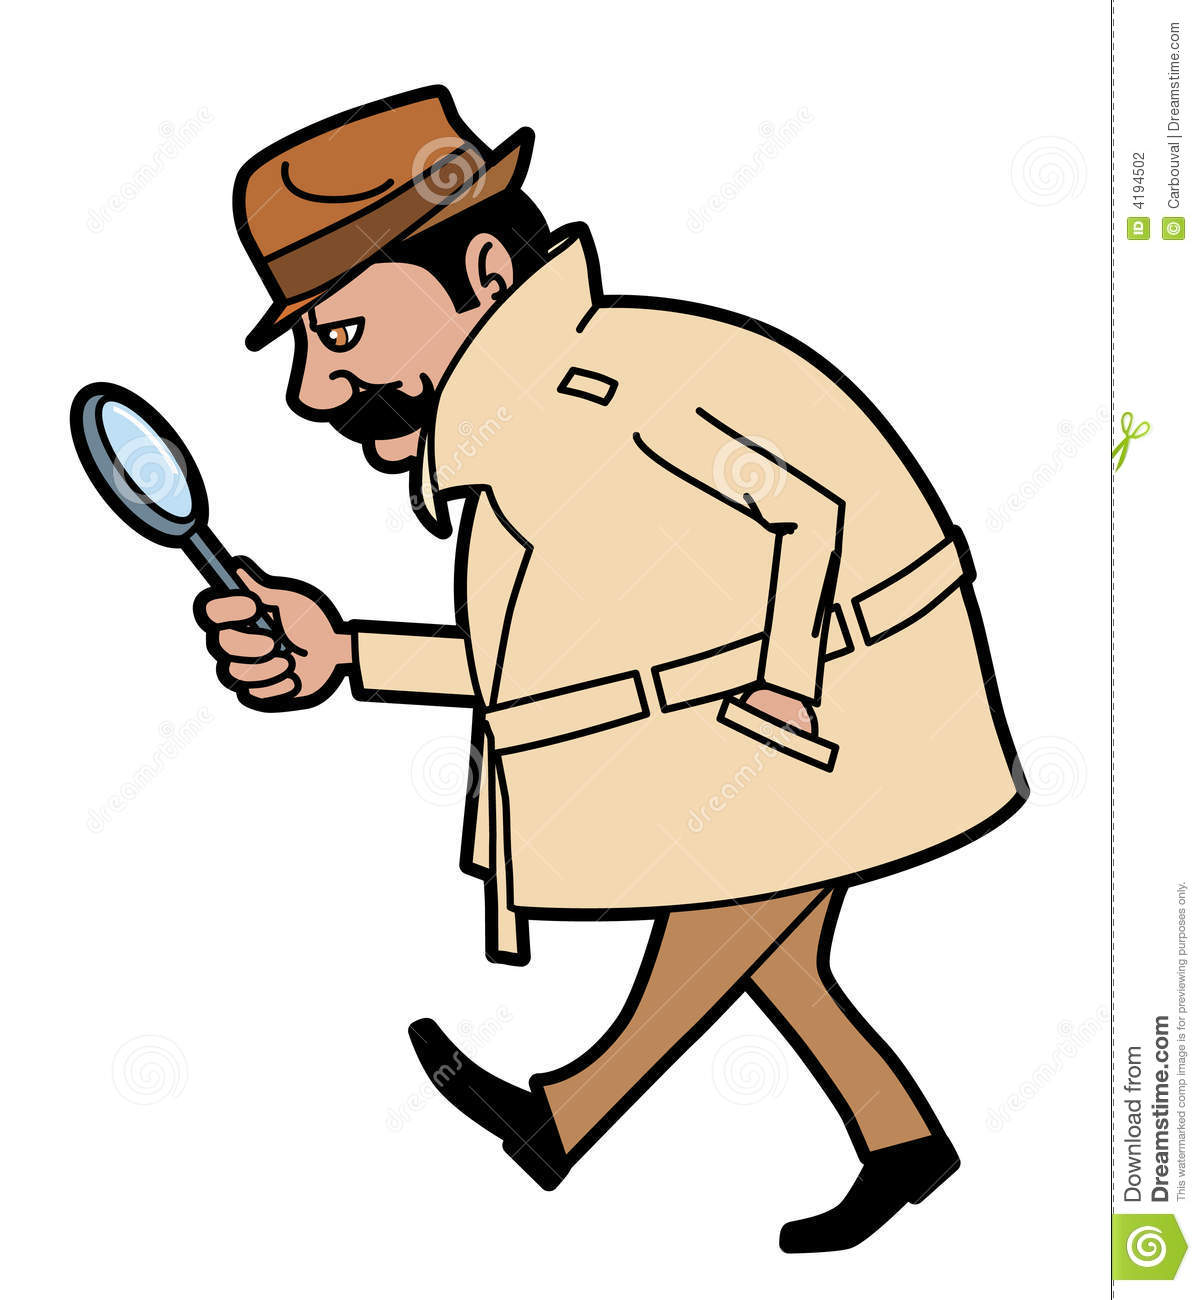 1201x1300 Situation Clipart Investigator